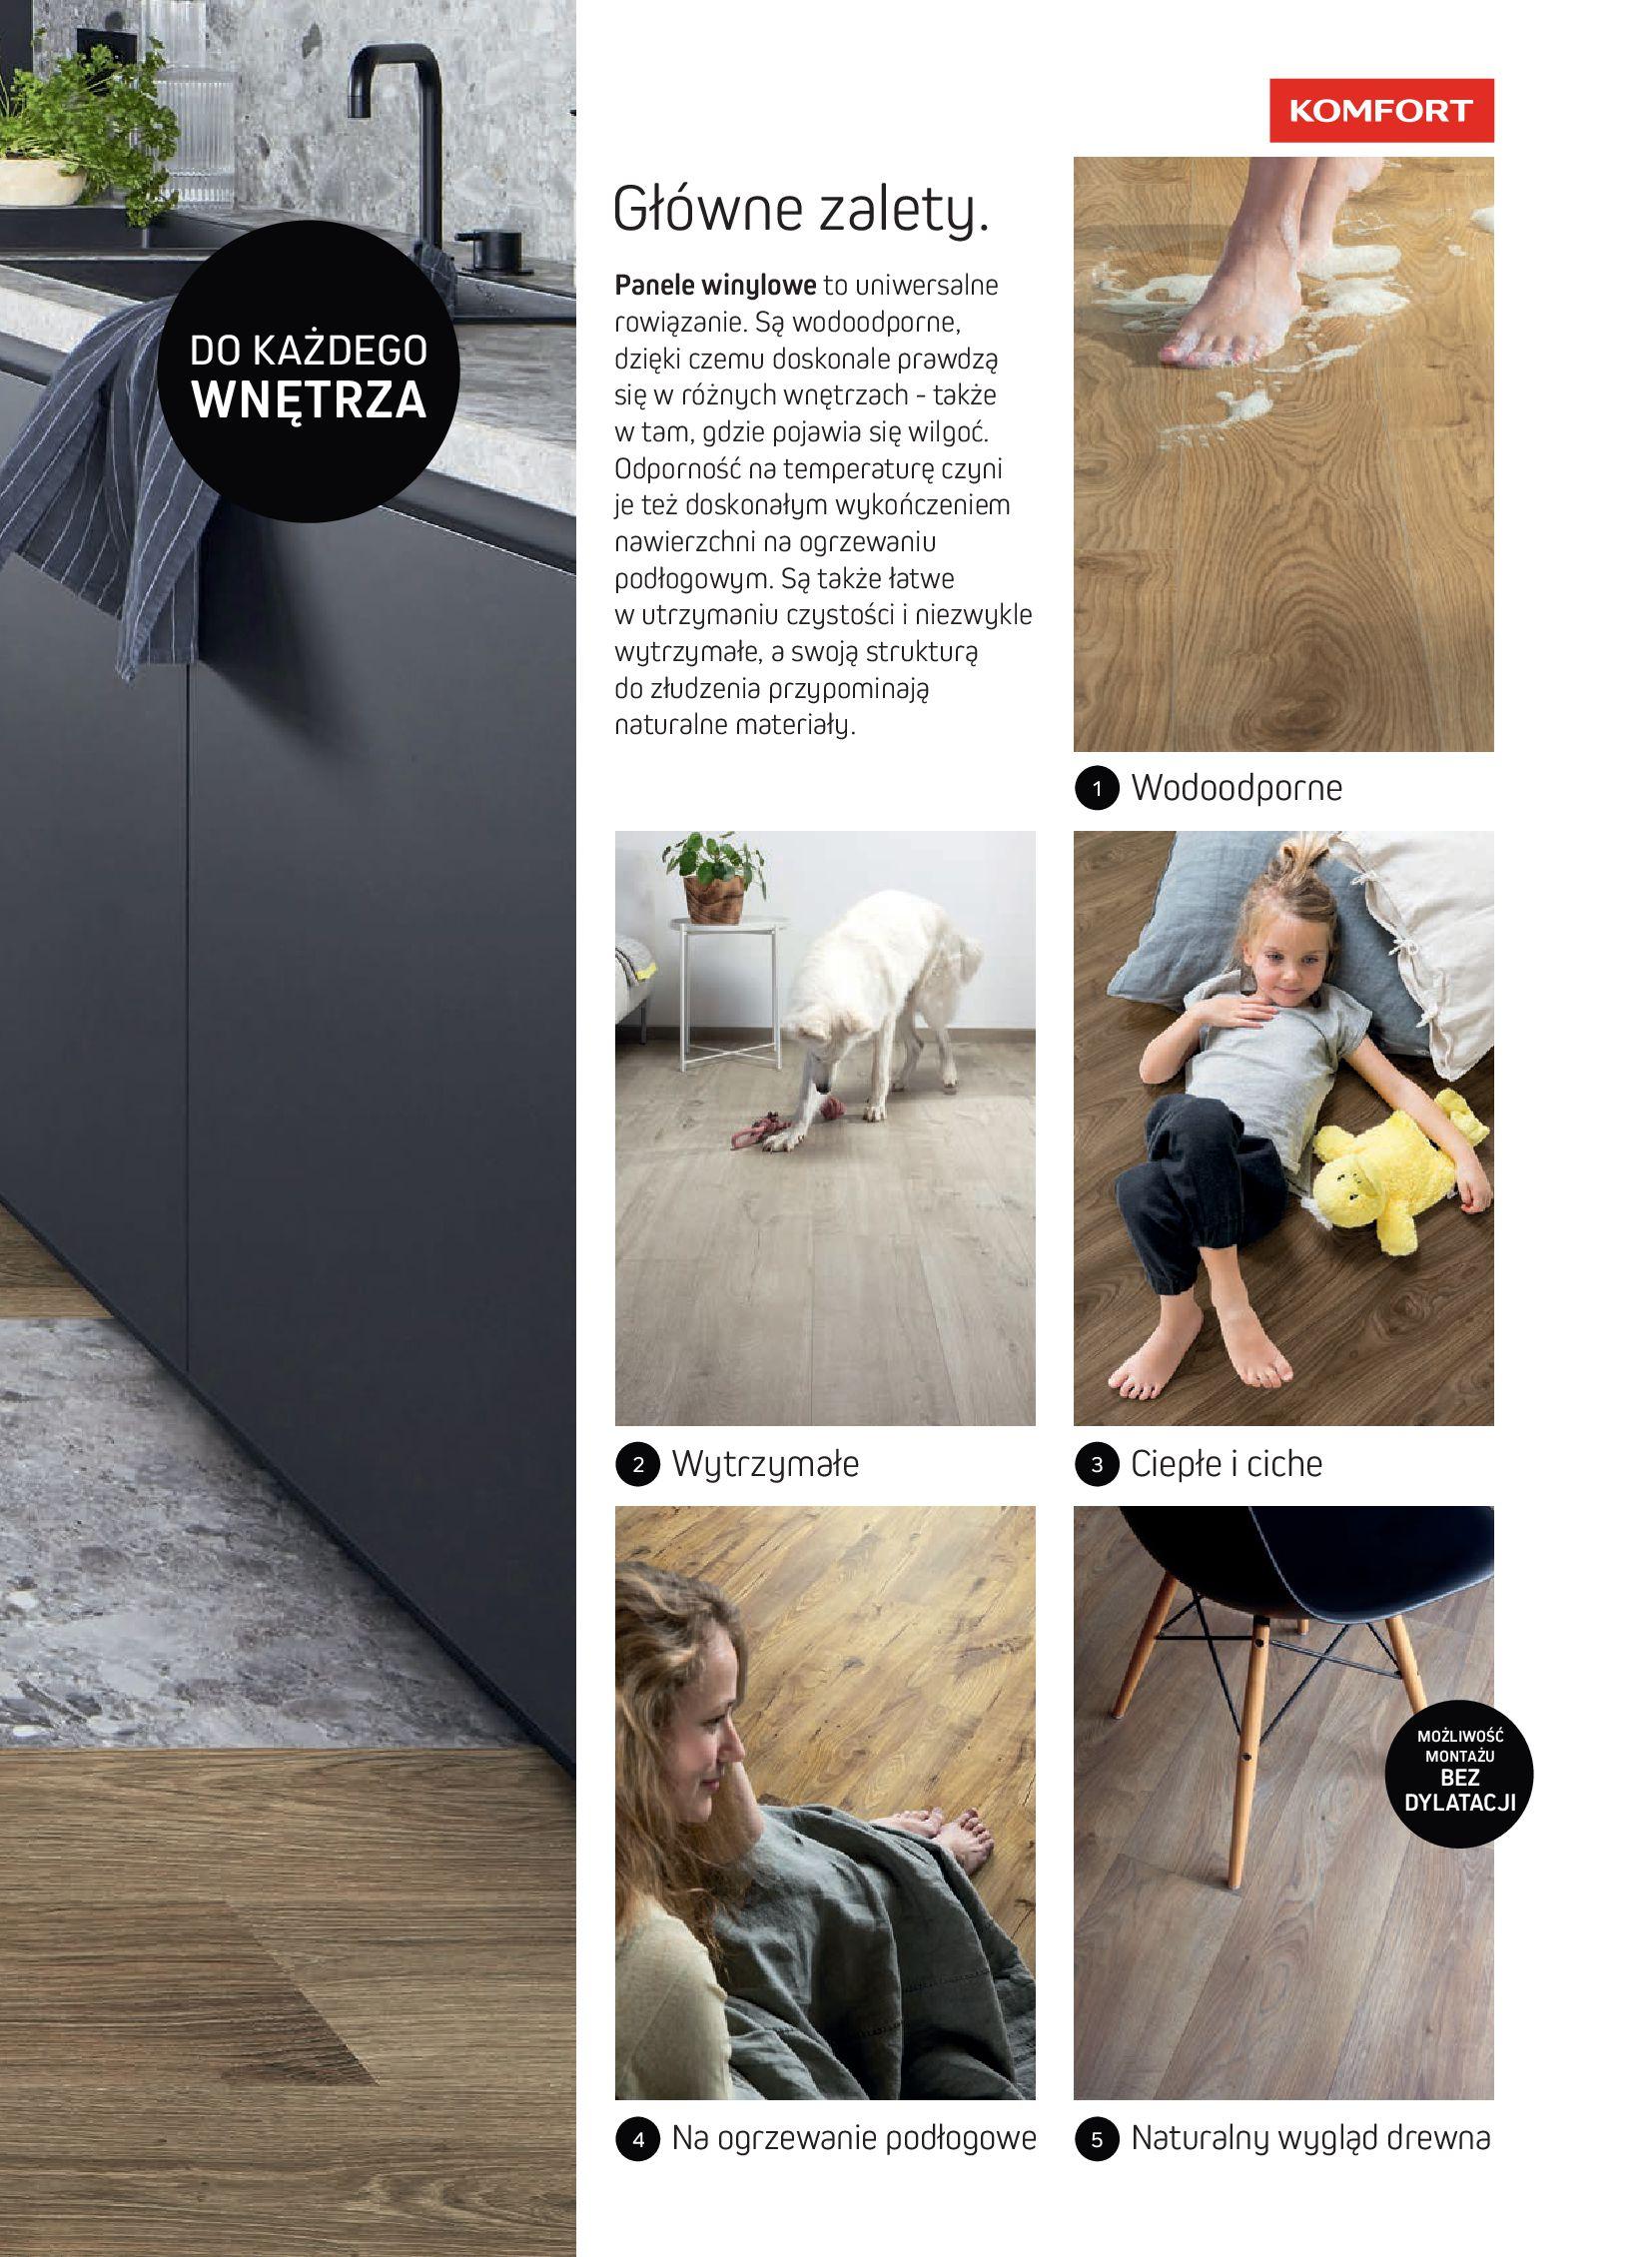 Gazetka Komfort: Gazetka Komfort - Katalog podłogi i drzwi 2021-06-16 page-5